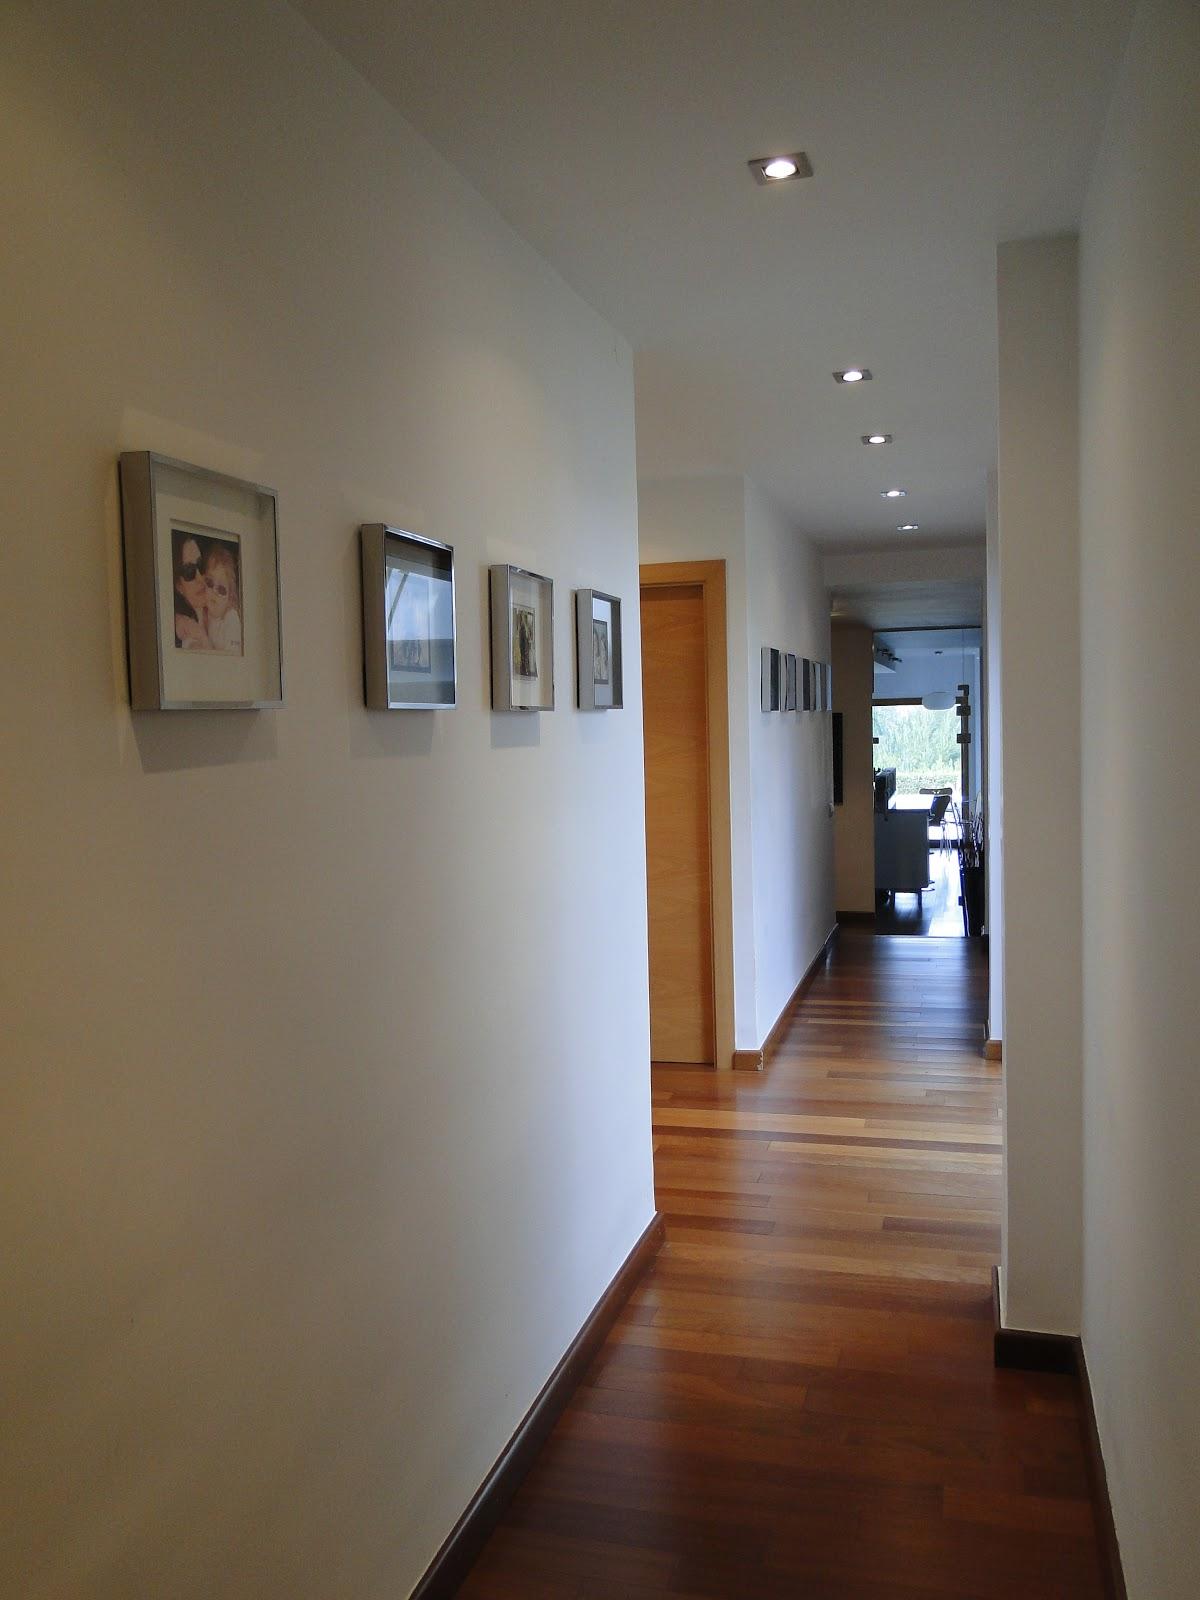 Planos low cost pasillo con luz natural - Como decorar un pasillo estrecho y oscuro ...